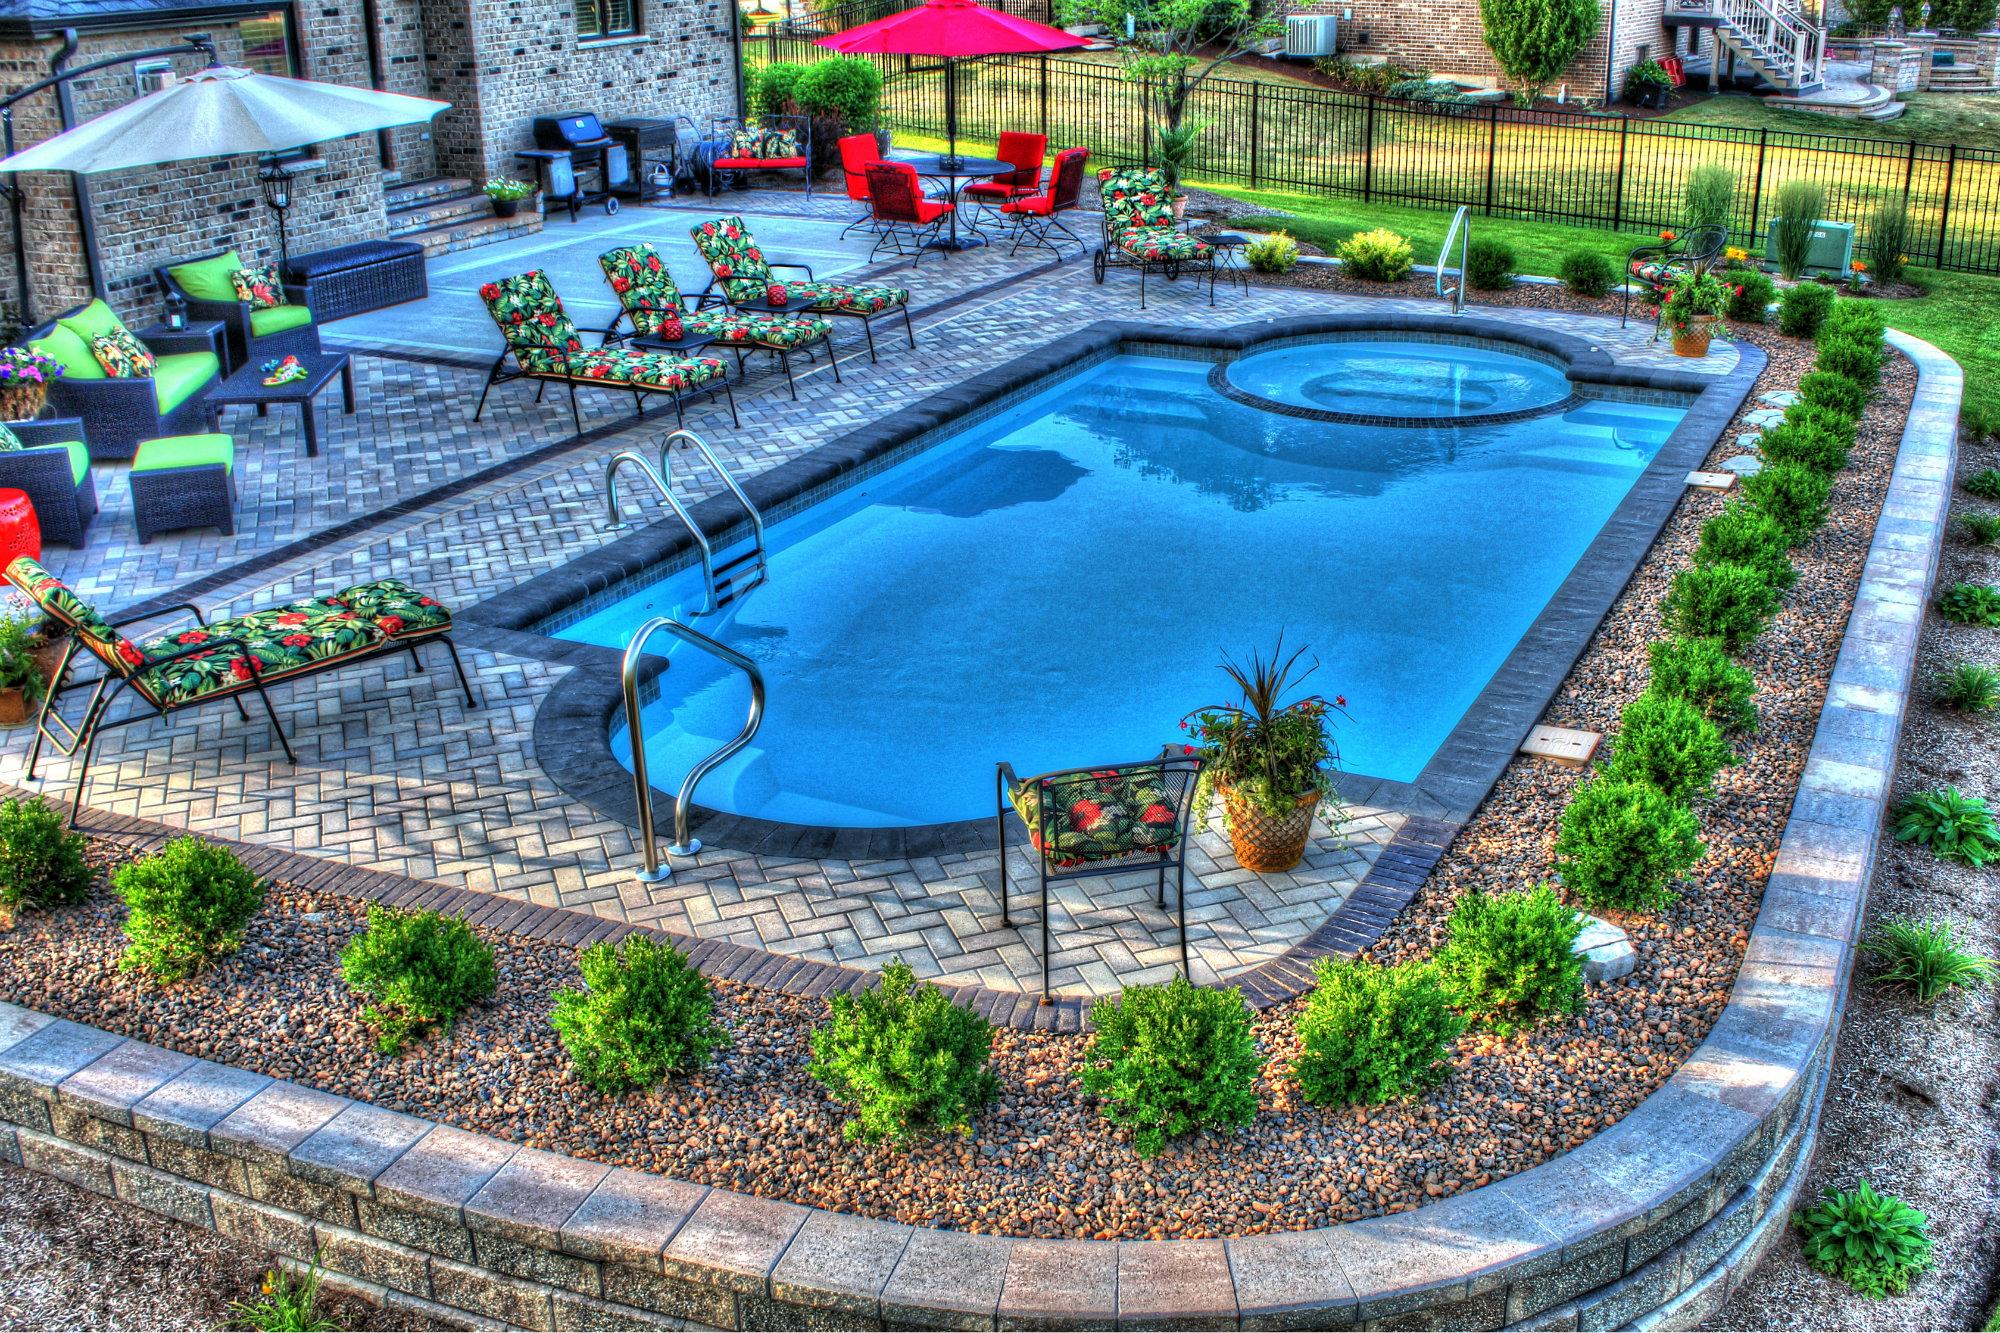 All Seasons Pools, Spas & Outdoor Living's Fiberglass Pool ... on Outdoor Living Pool And Spa id=80421